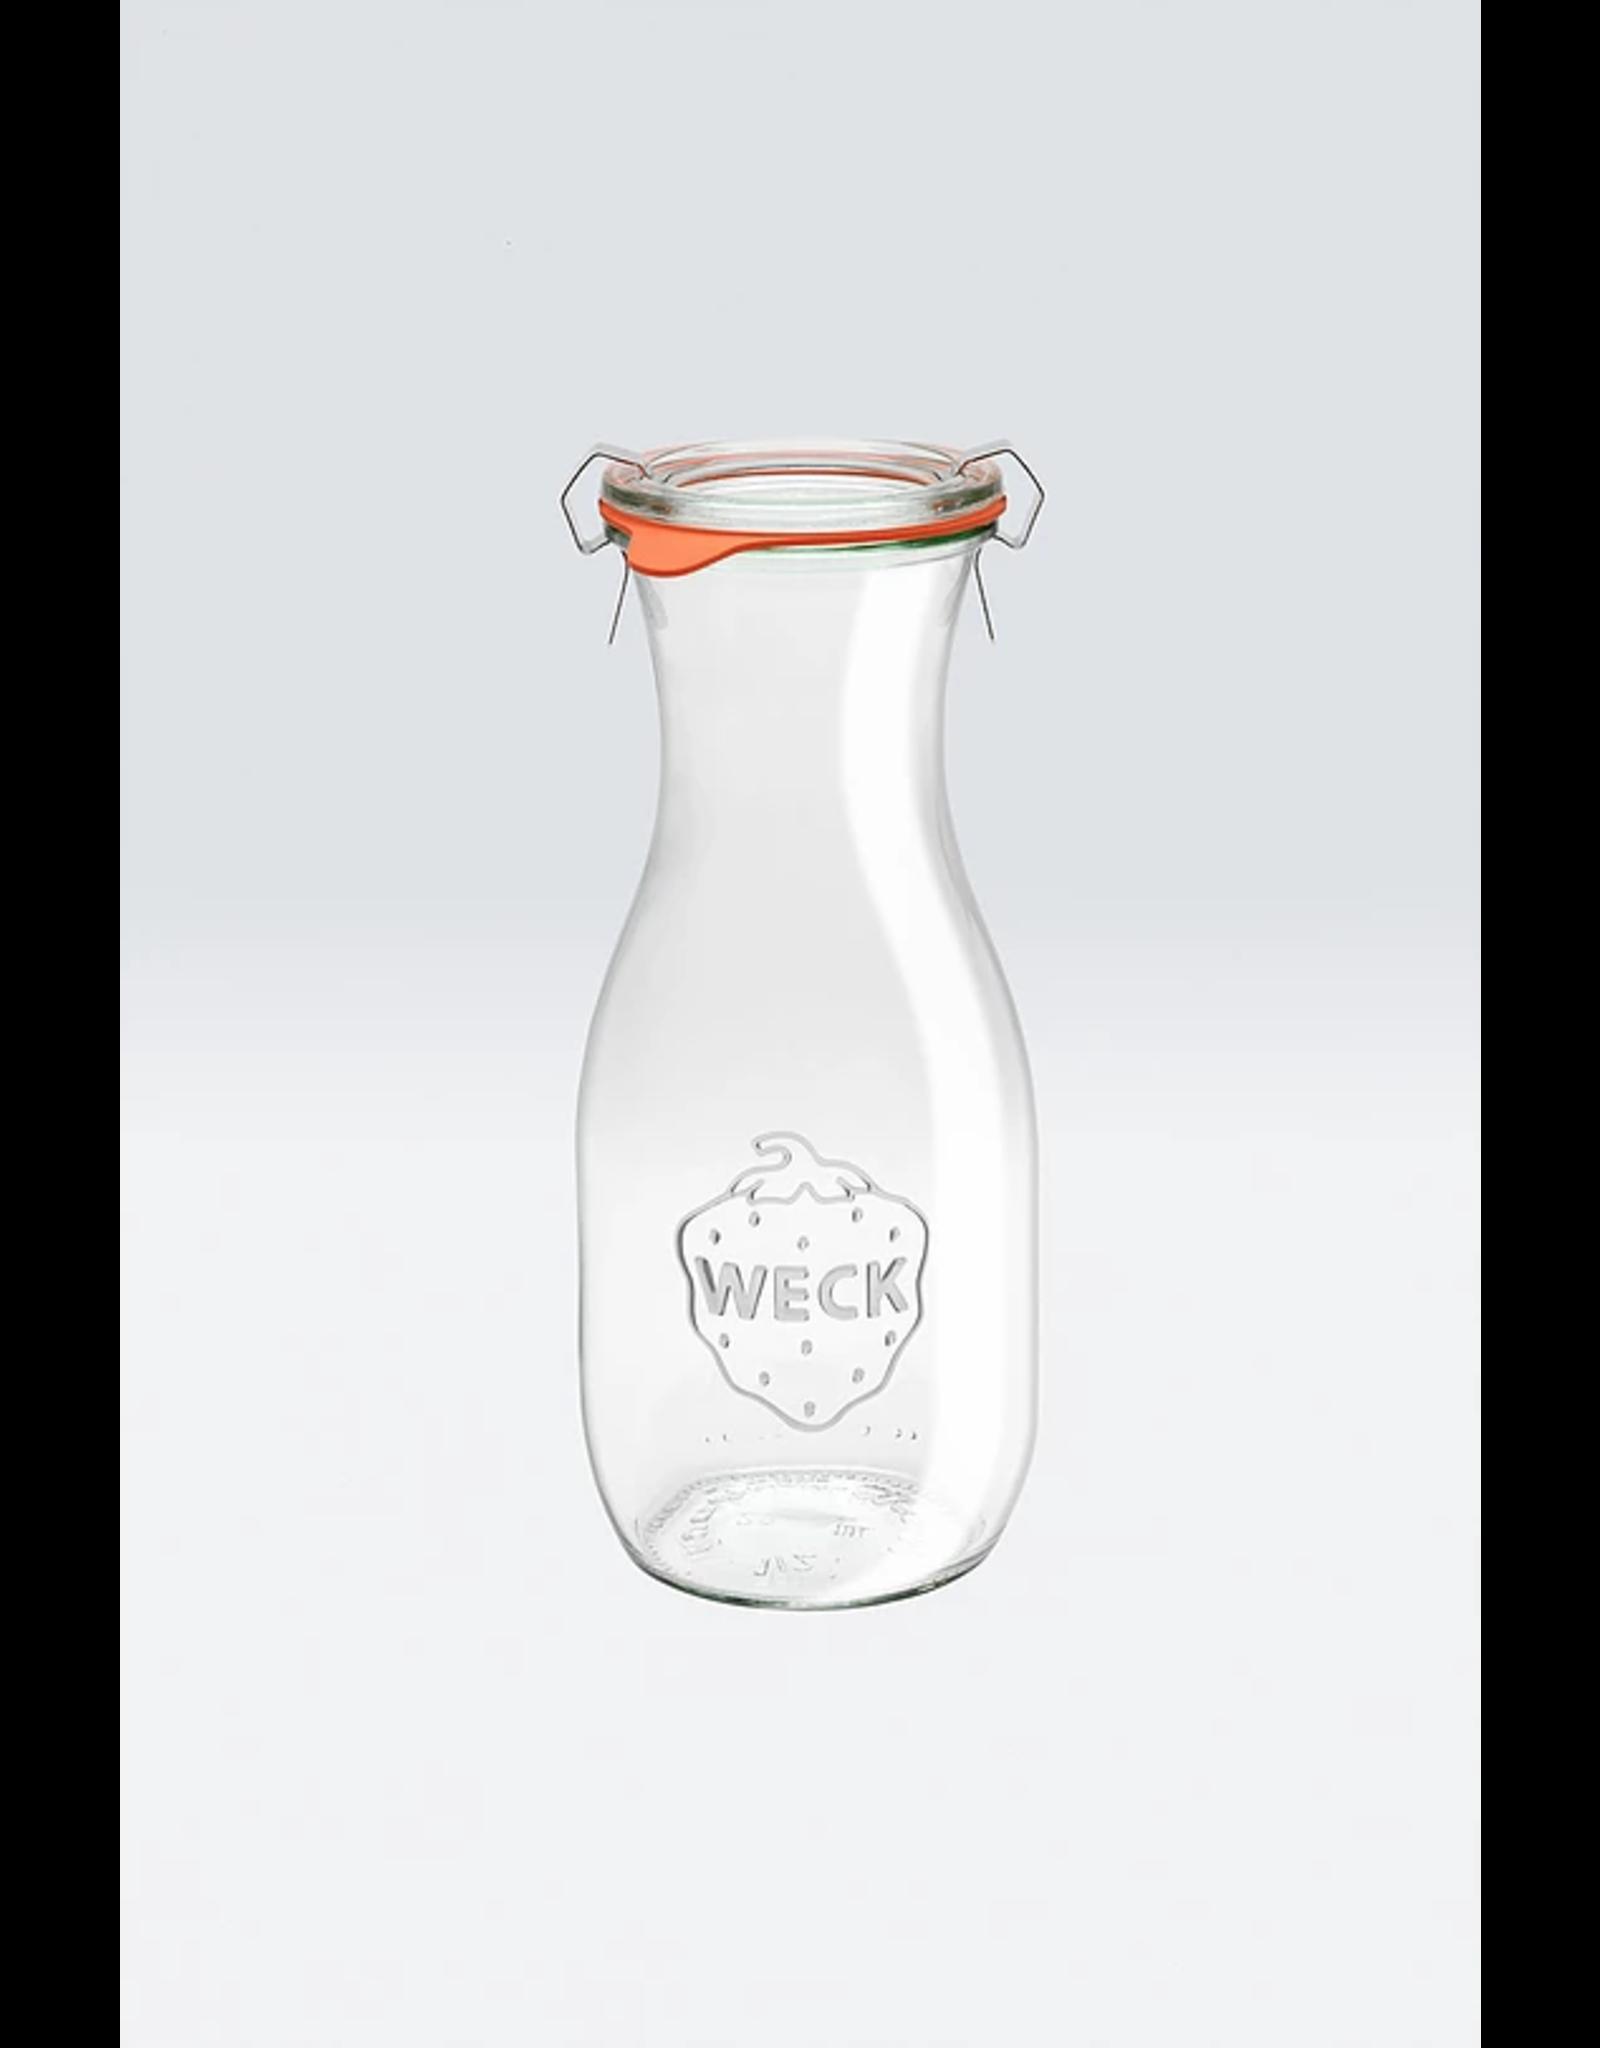 Weck Weck Juice Jars